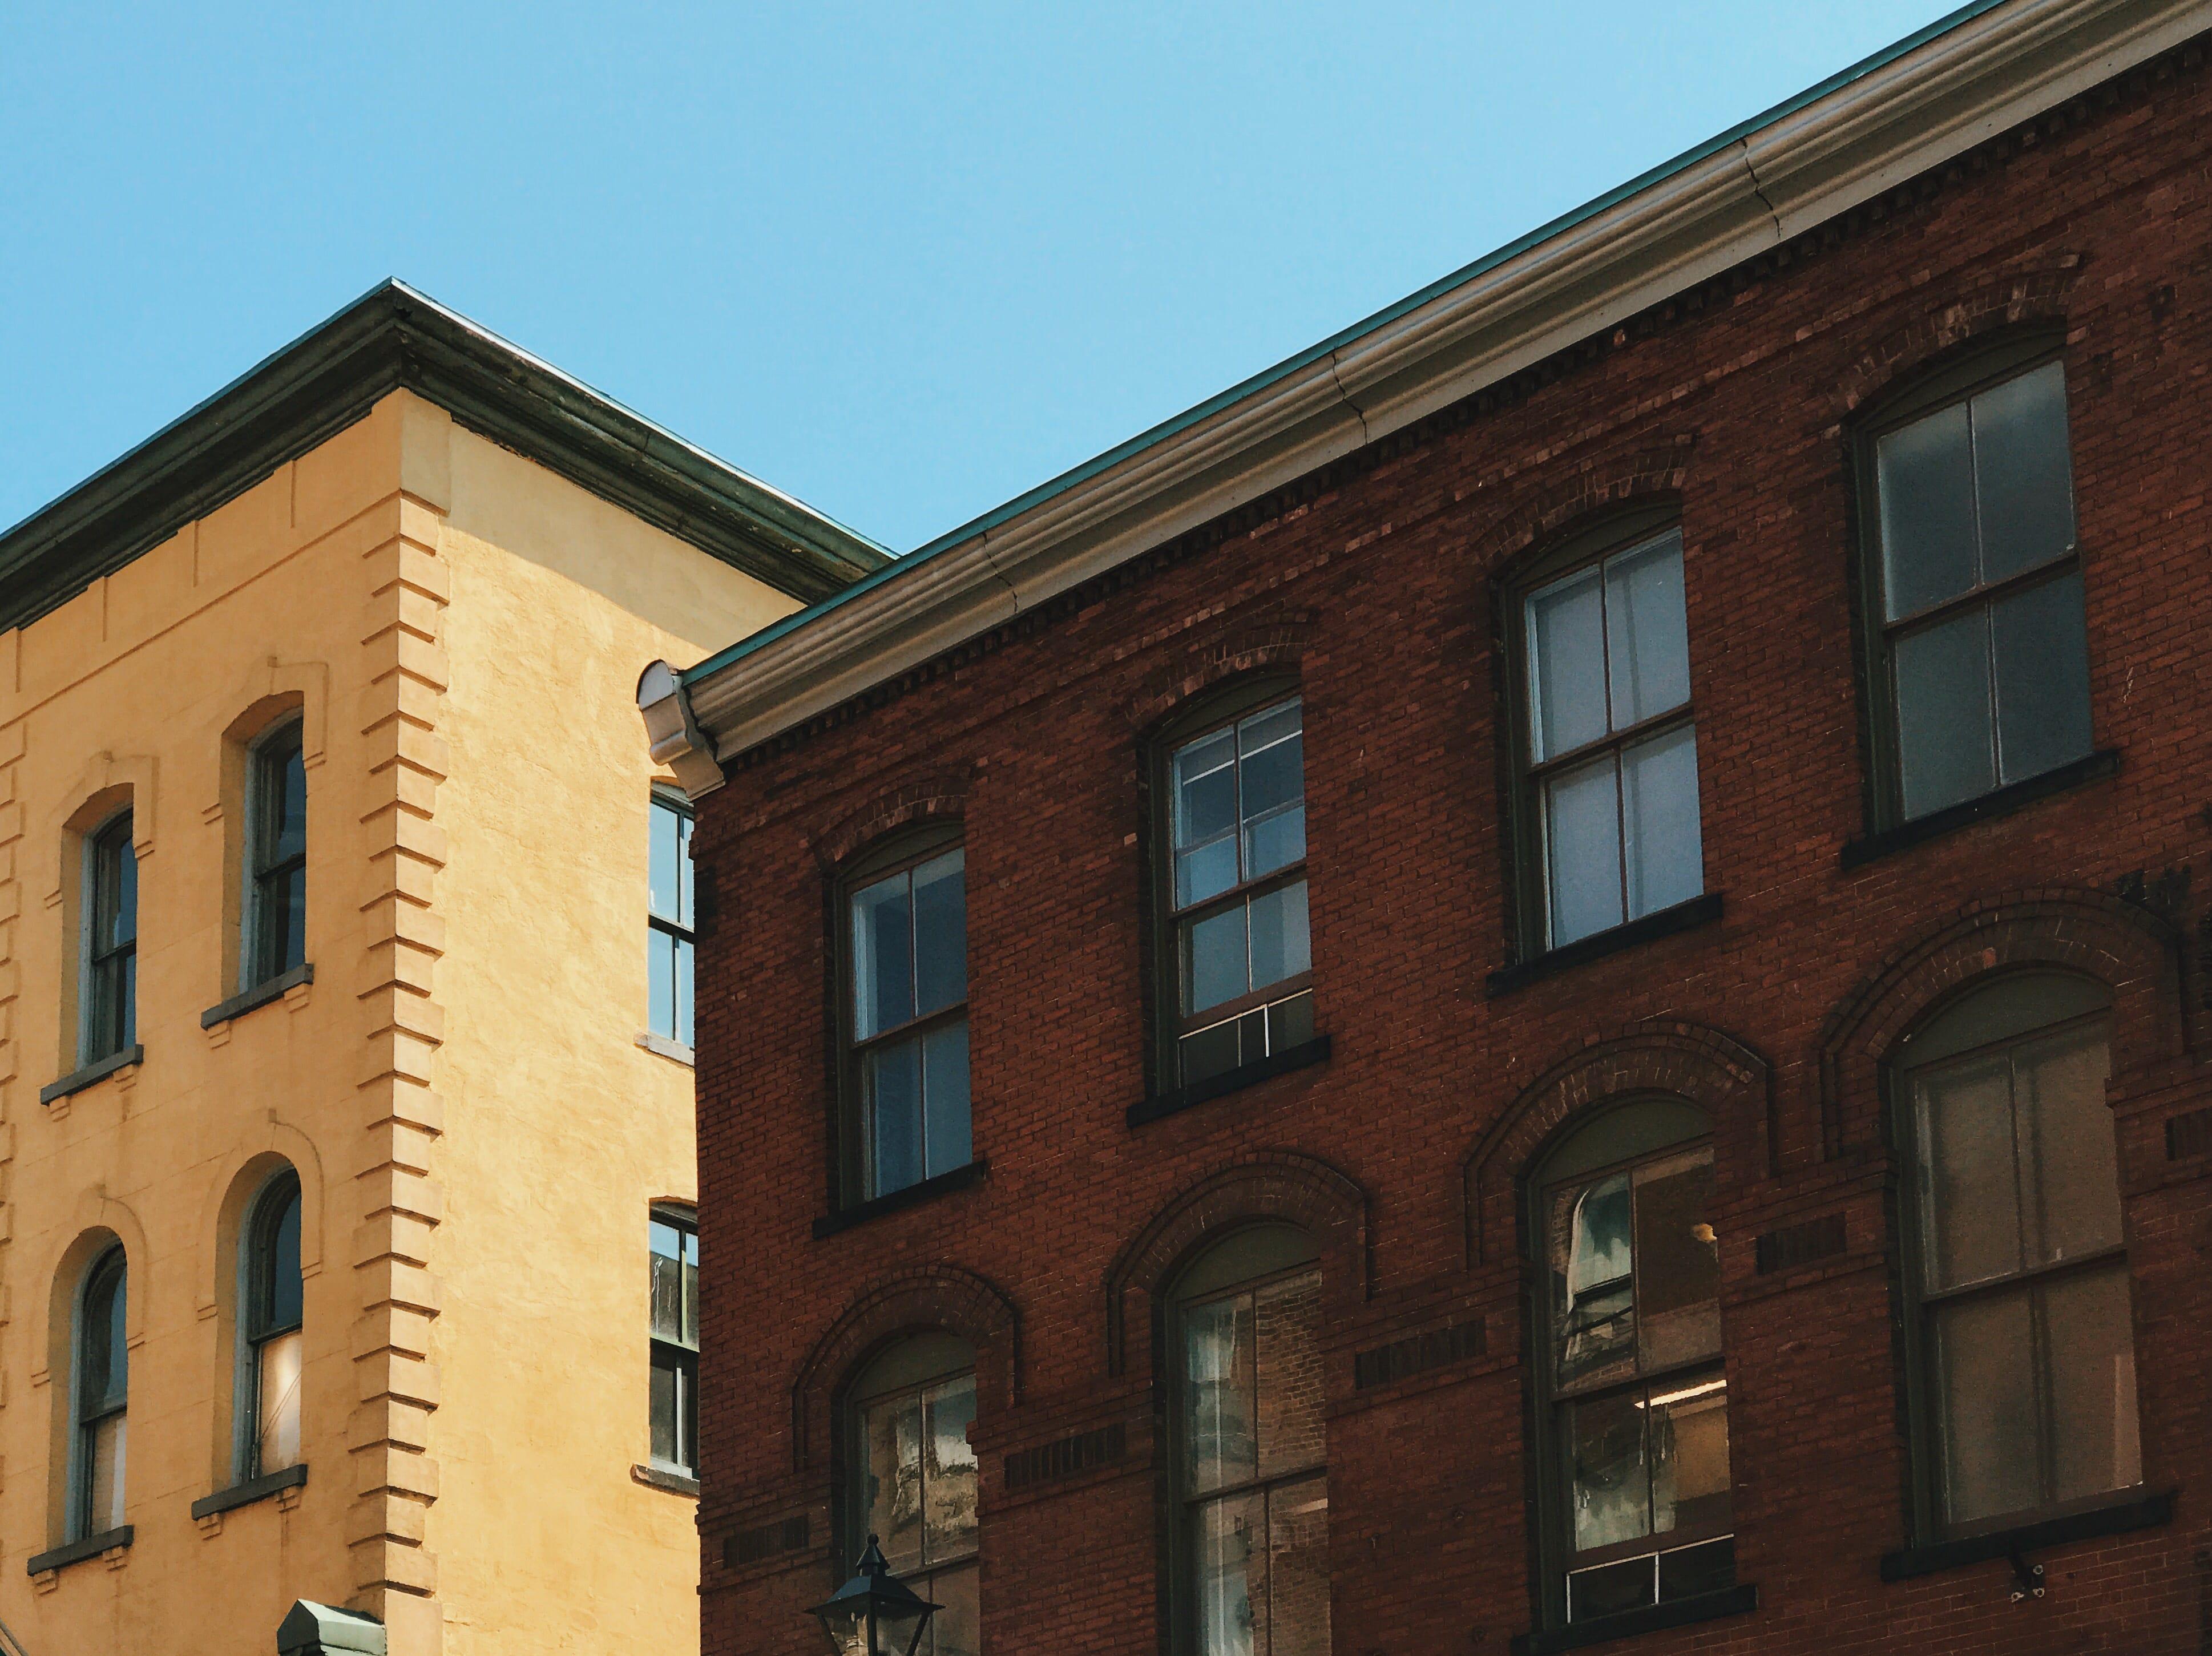 A photograph depicting Princess Street Buildings